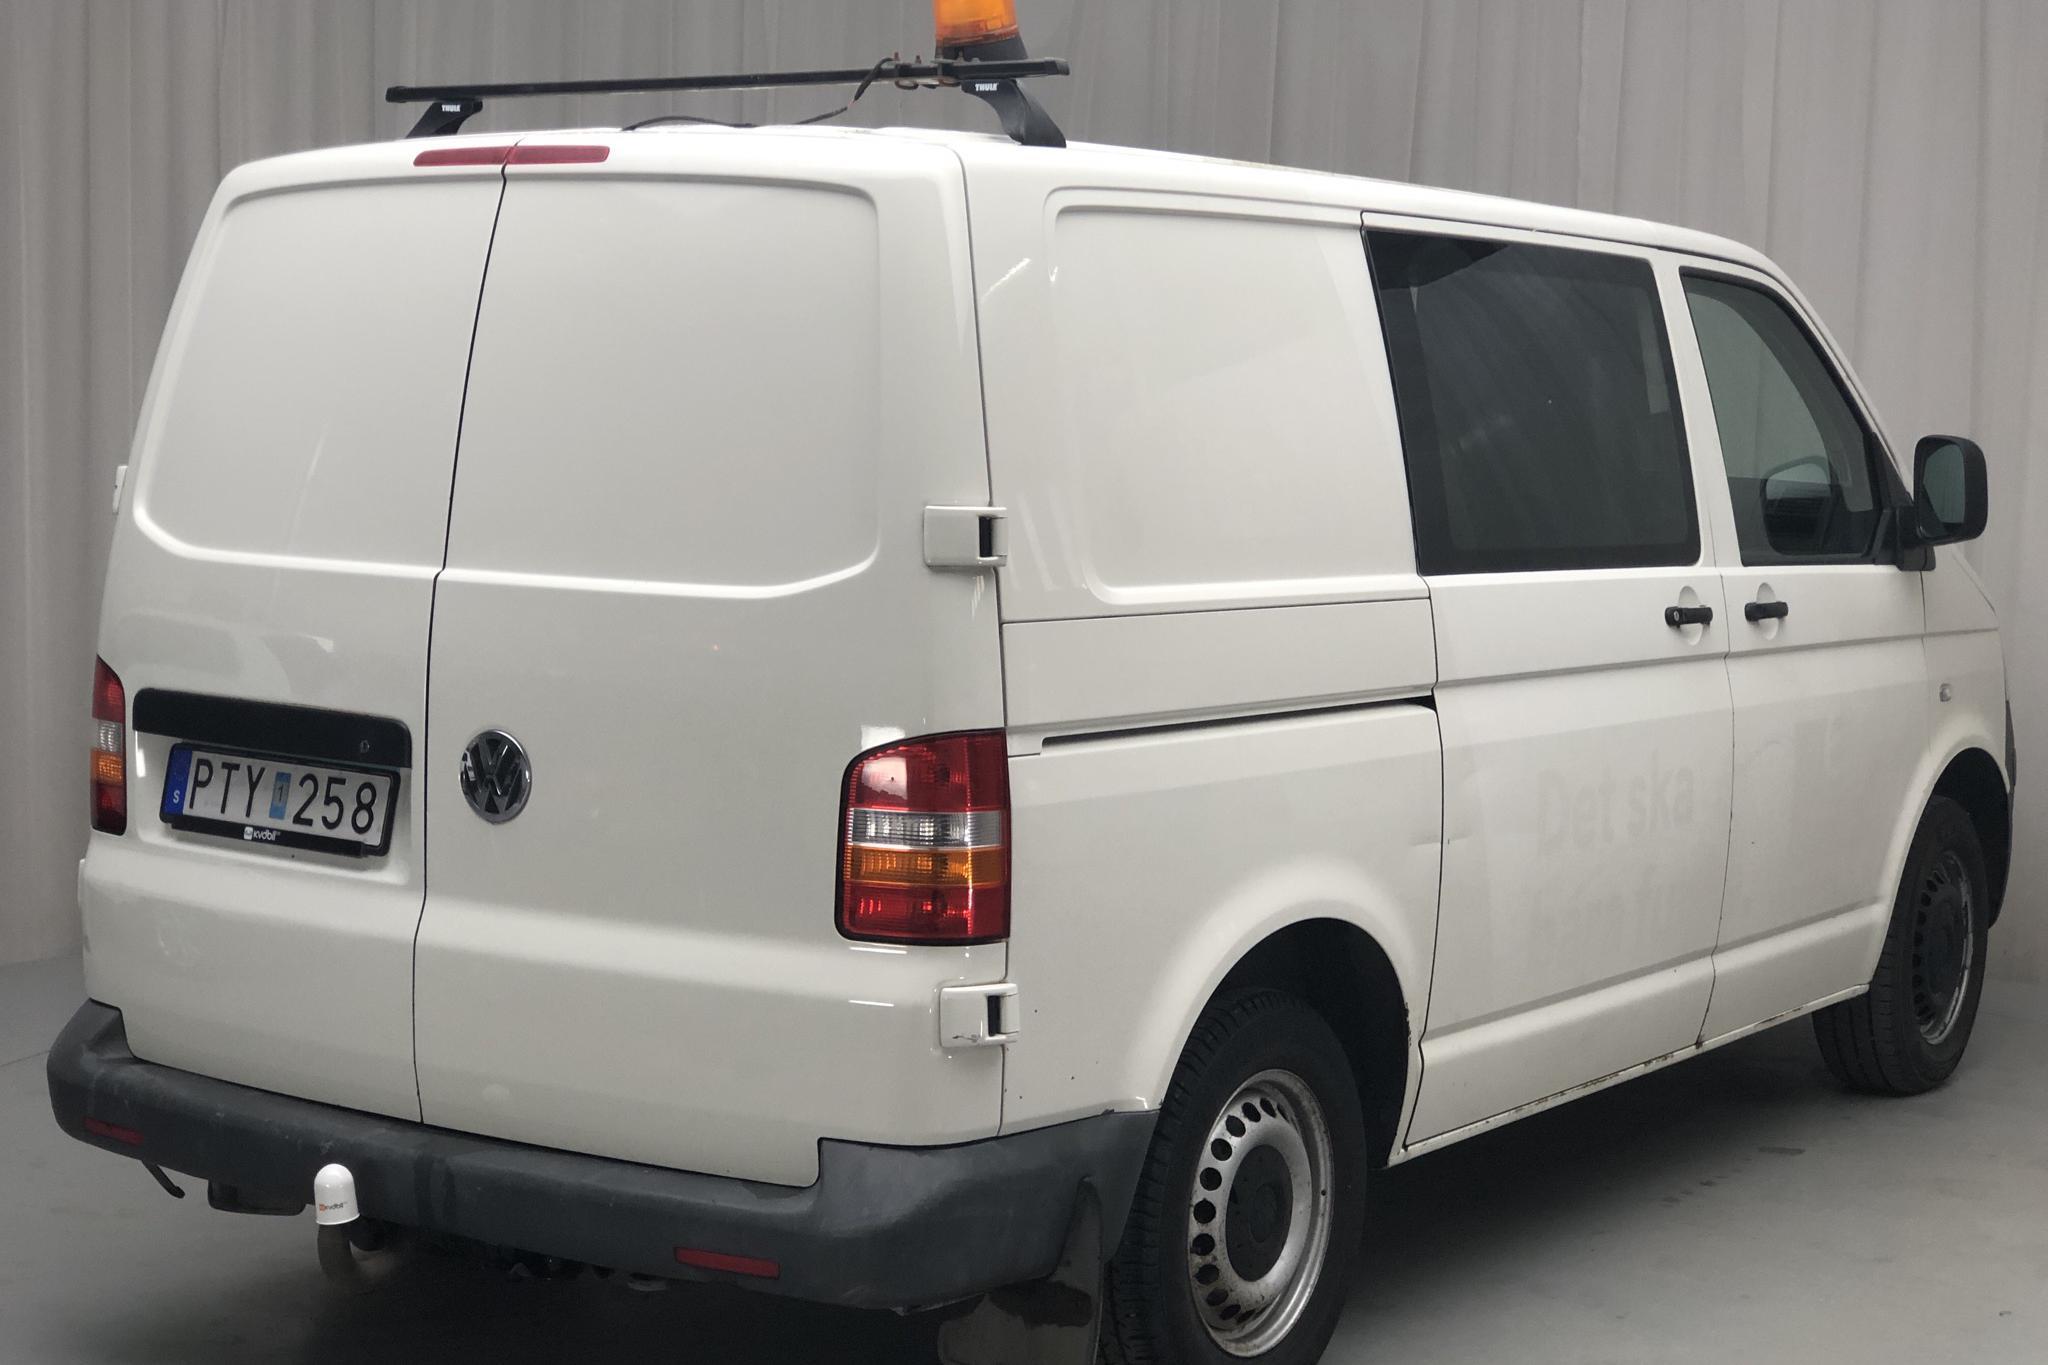 VW Transporter T5 2.5 TDI (130hk) - 149 610 km - Automatic - 2007